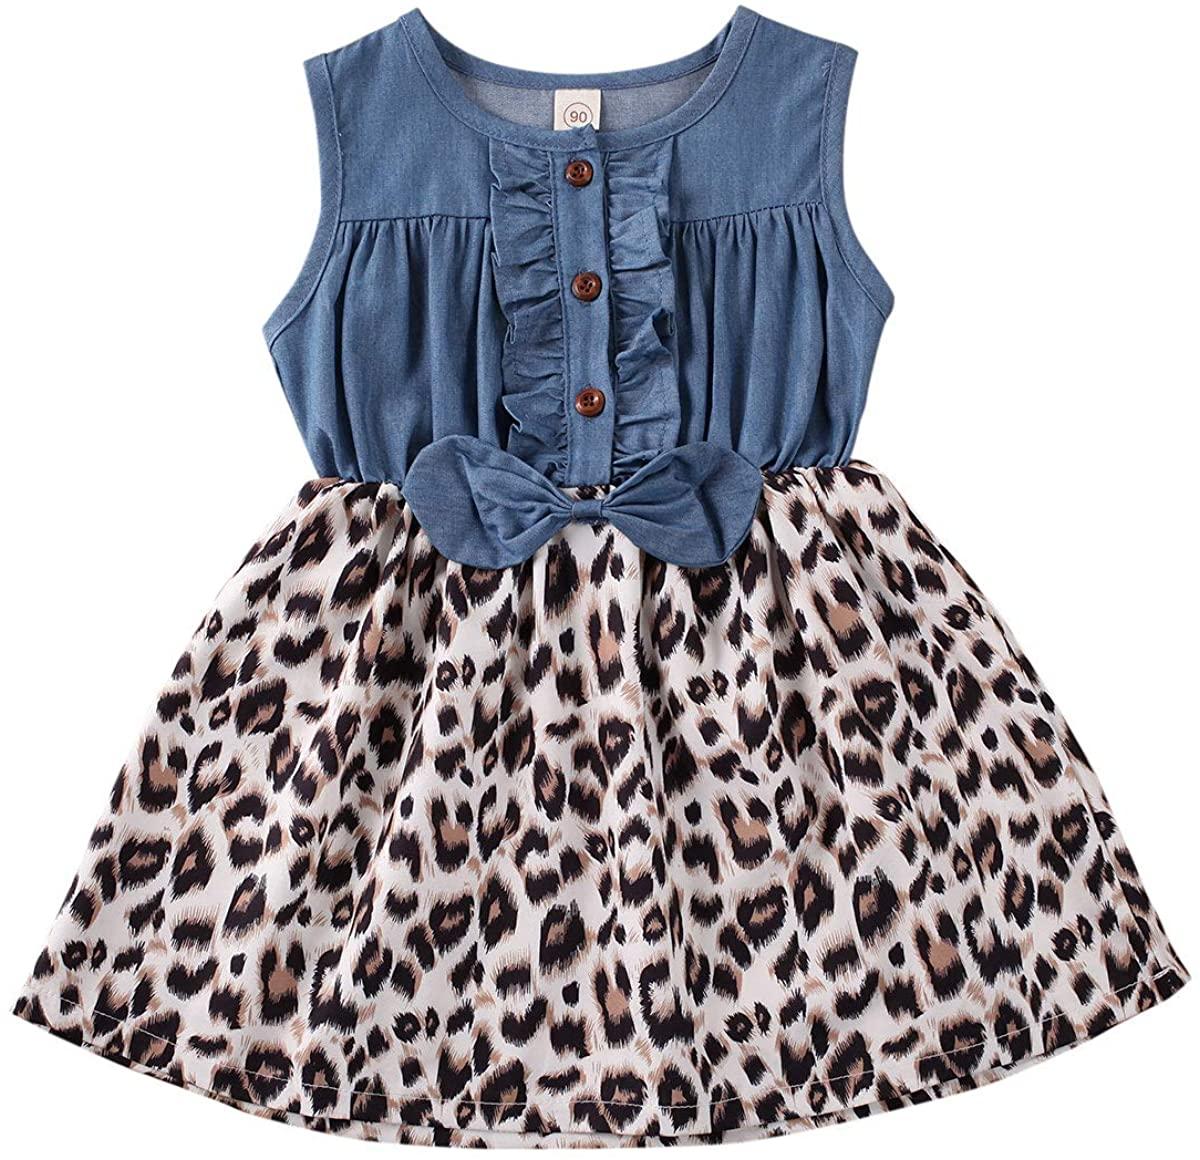 Ambabe Toddler Baby Girl Clothes Denim Sleeveless Bowknot Ruffled Button Stitching Leopard Print Tutu Dress Sundress Outfit